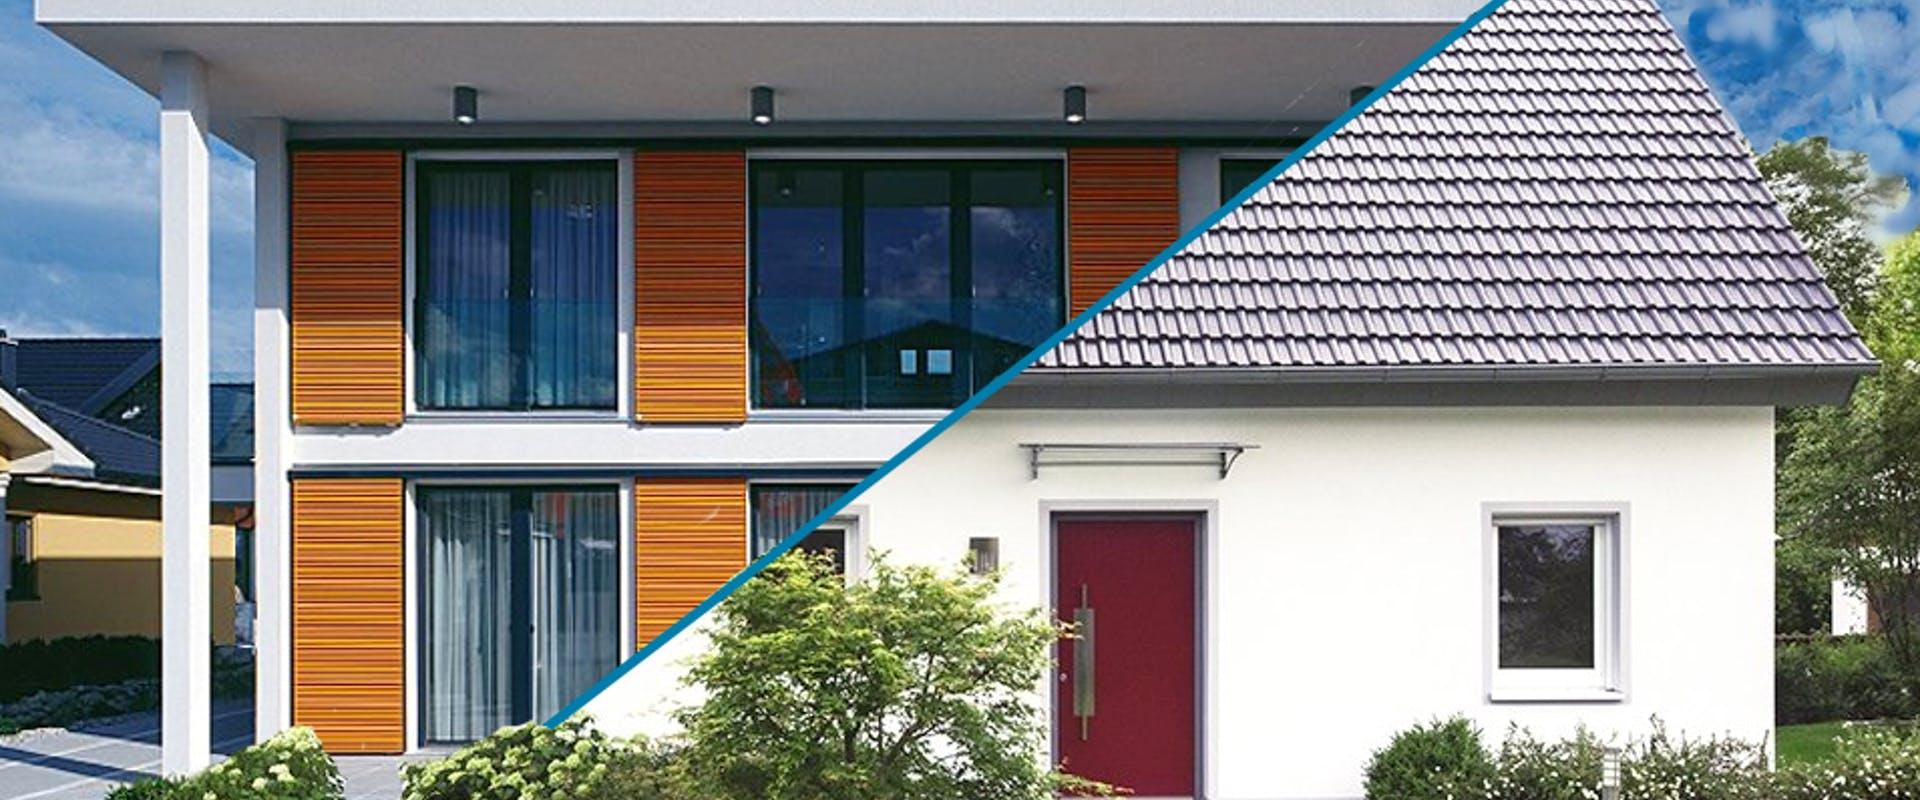 Fertighaus oder Massivhaus: Was ist besser? | Fertighaus.de Ratgeber